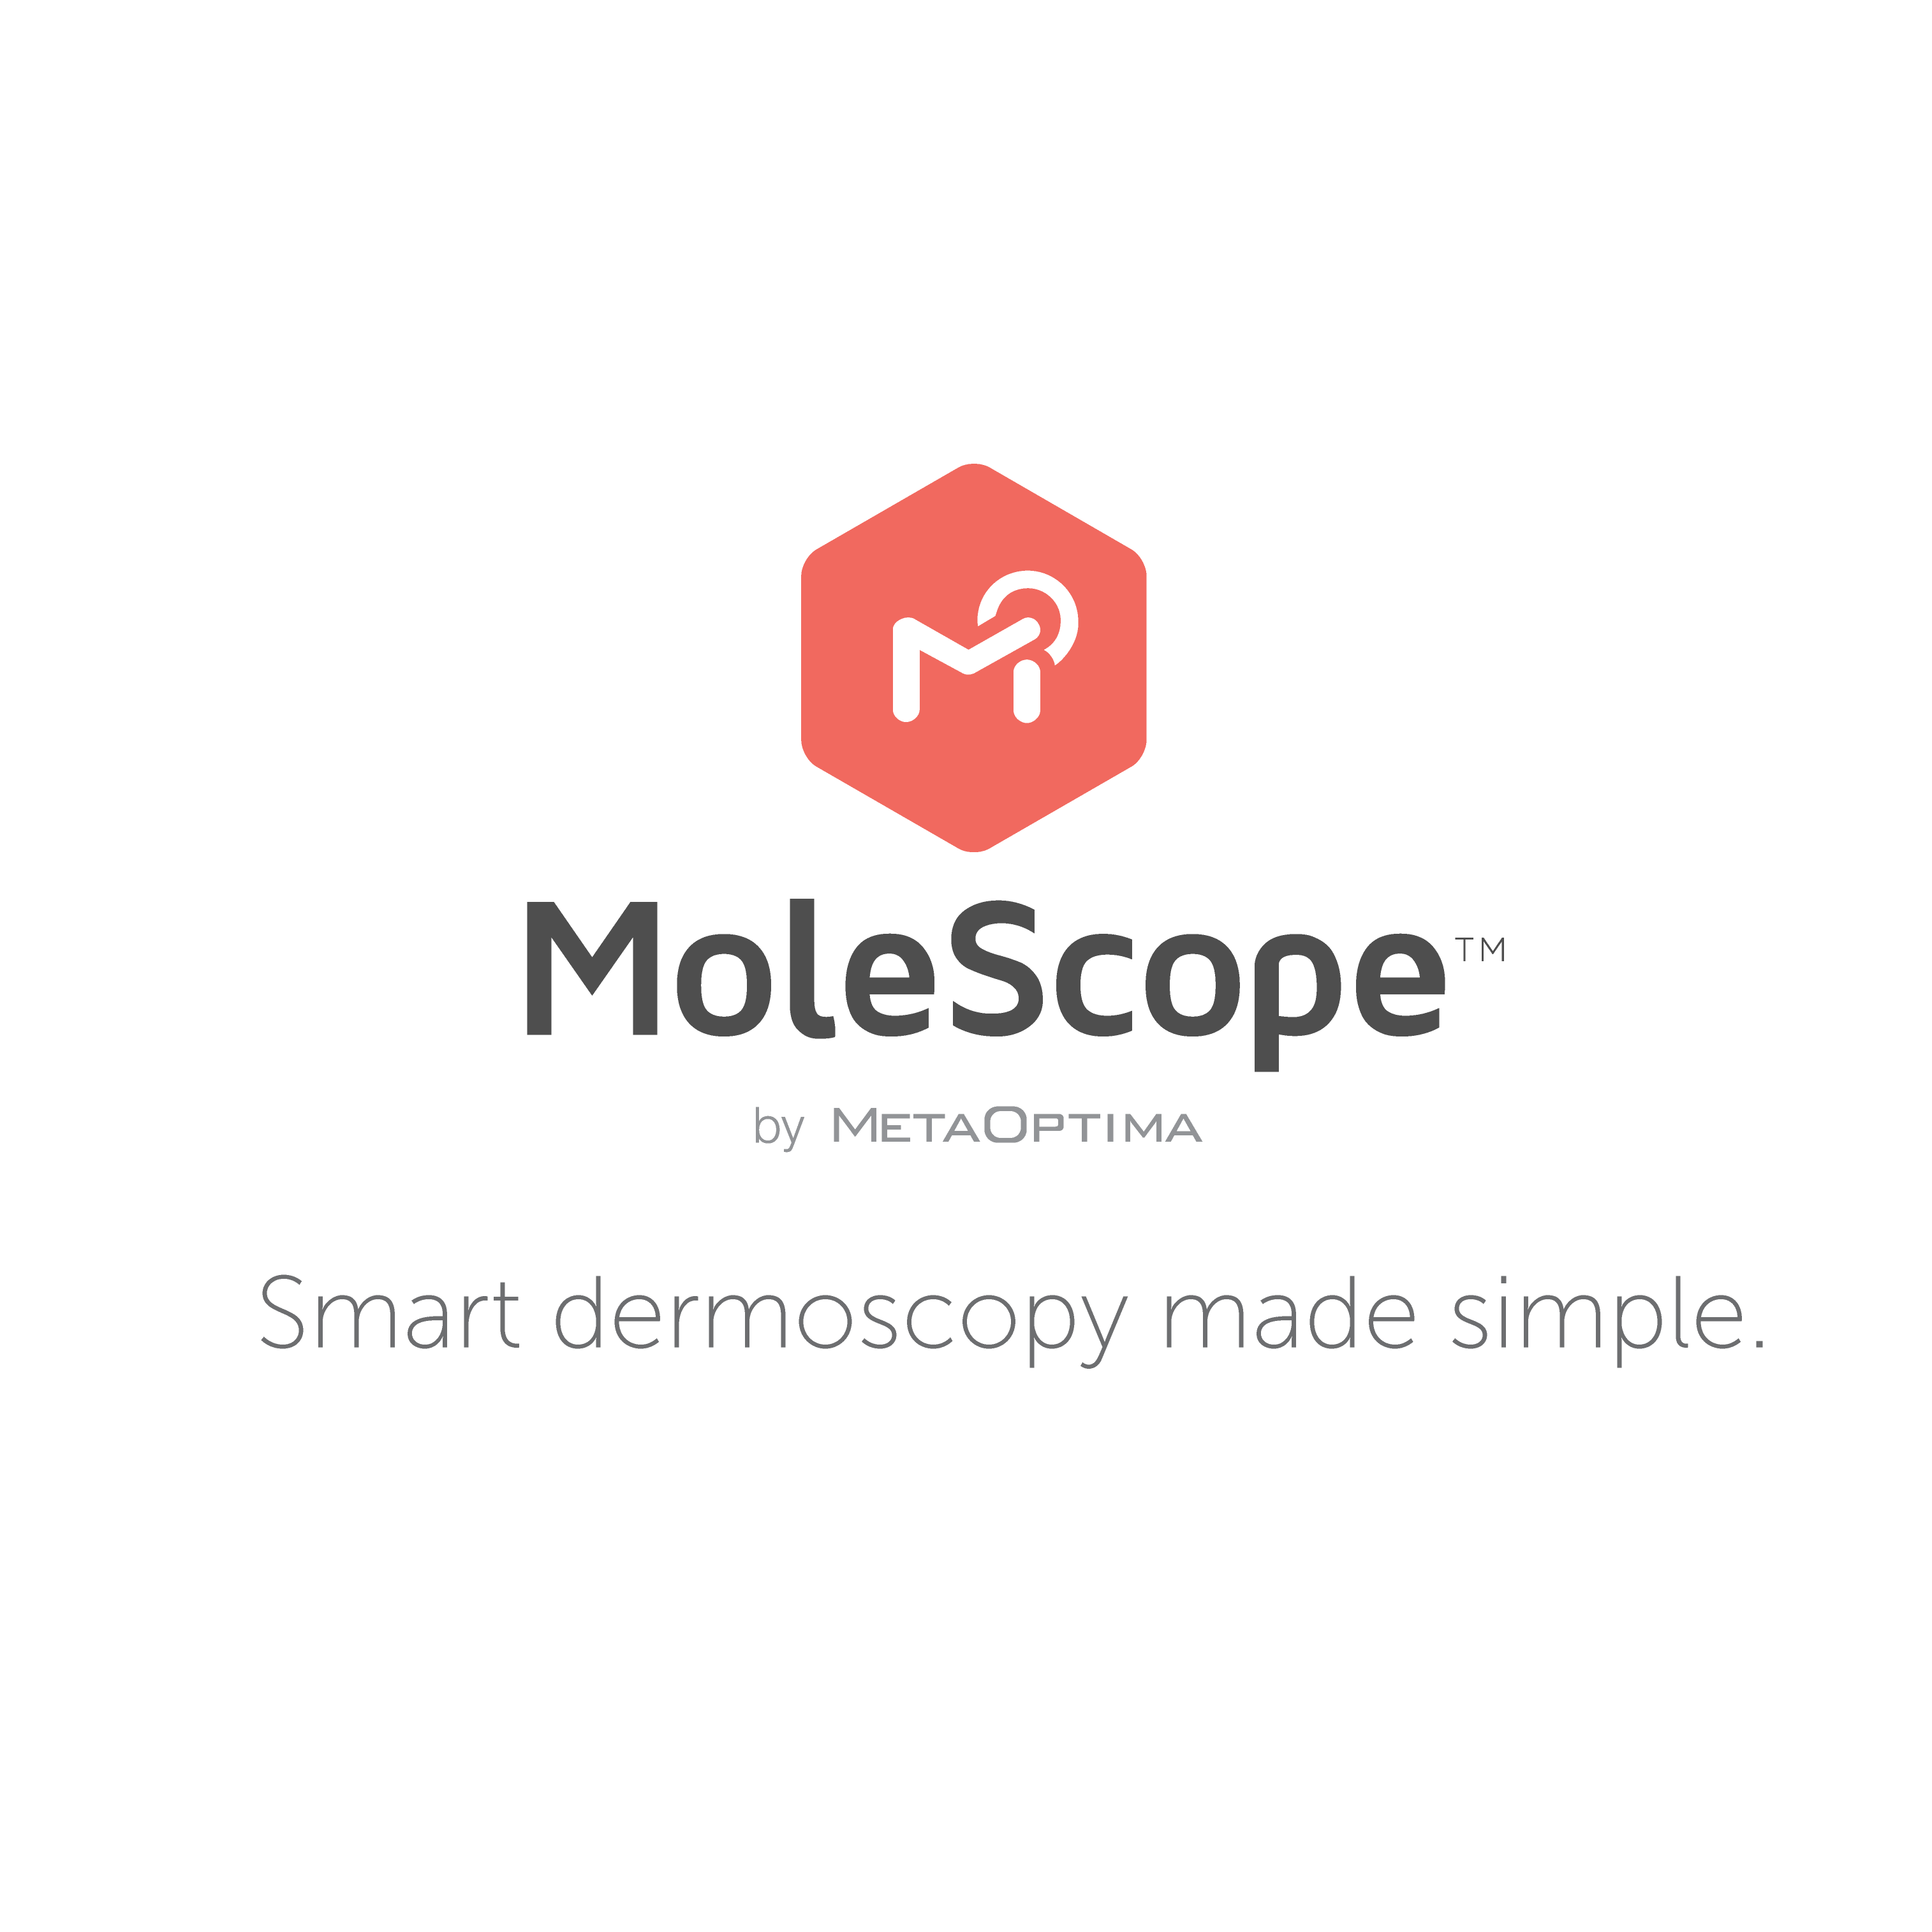 MoleScope logo